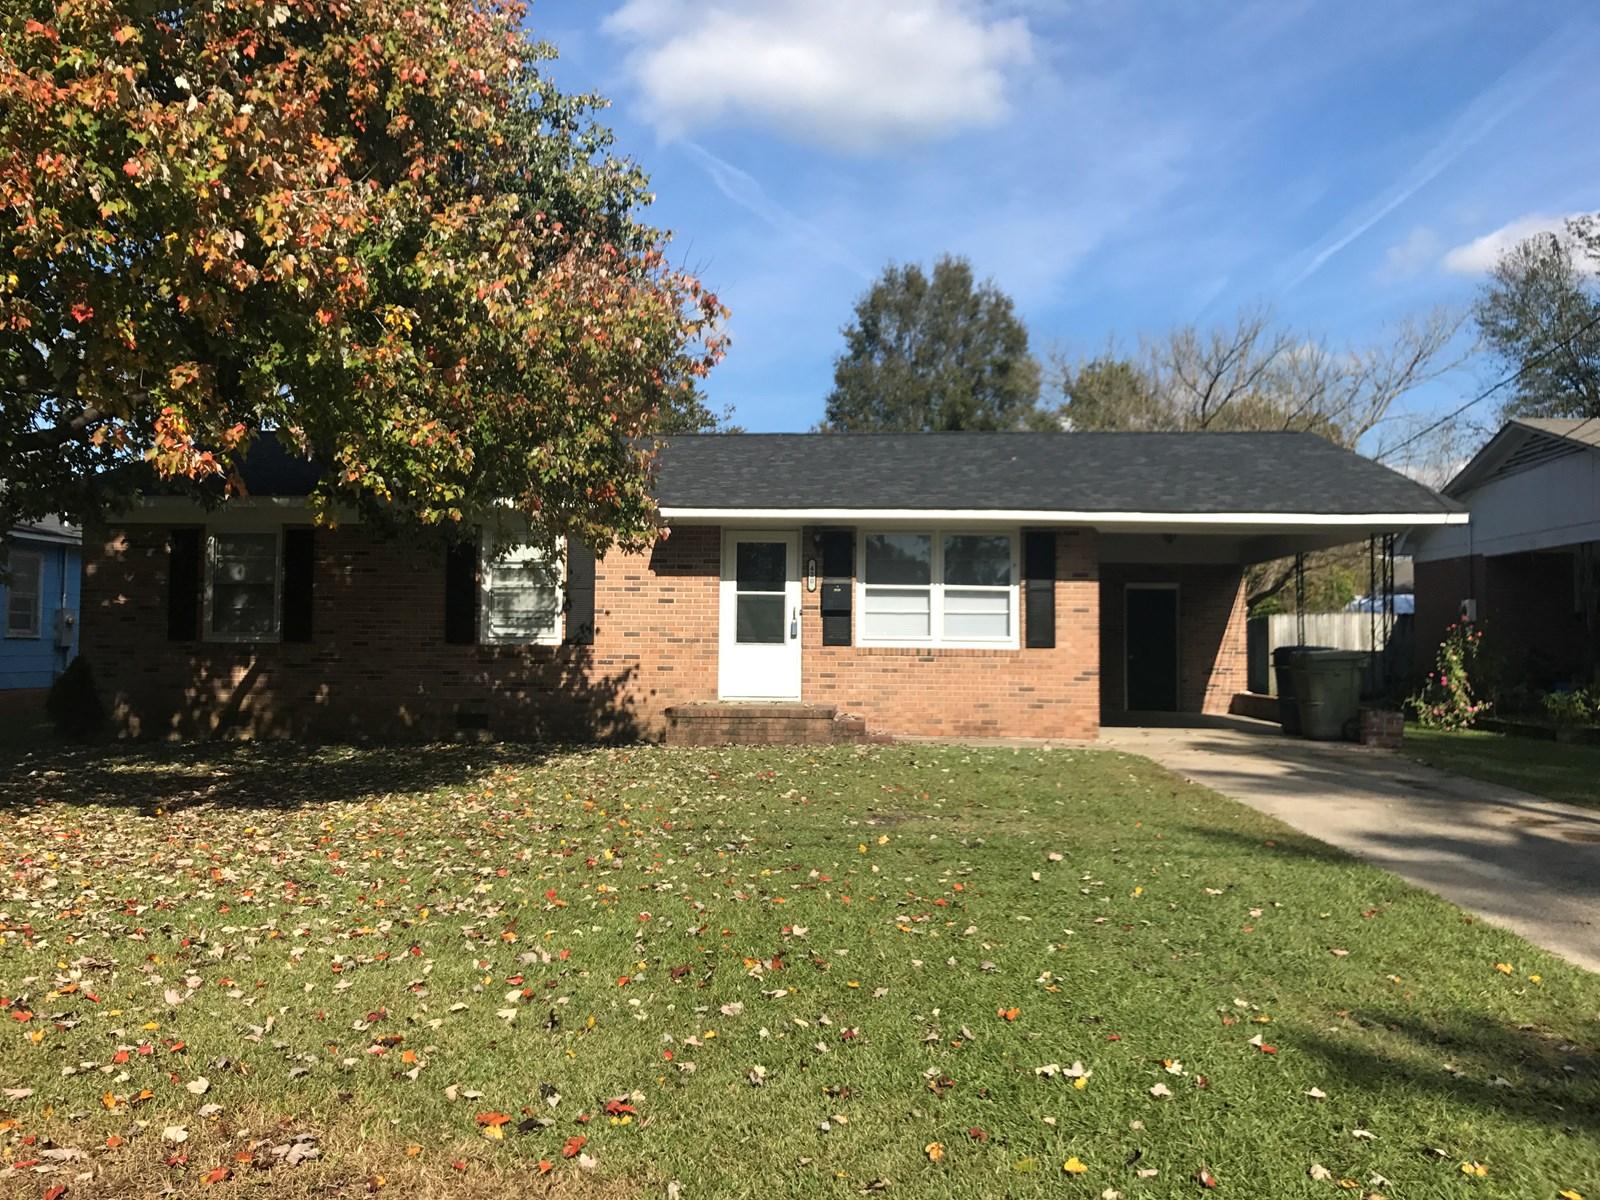 Washington, NC Brick home for Sale